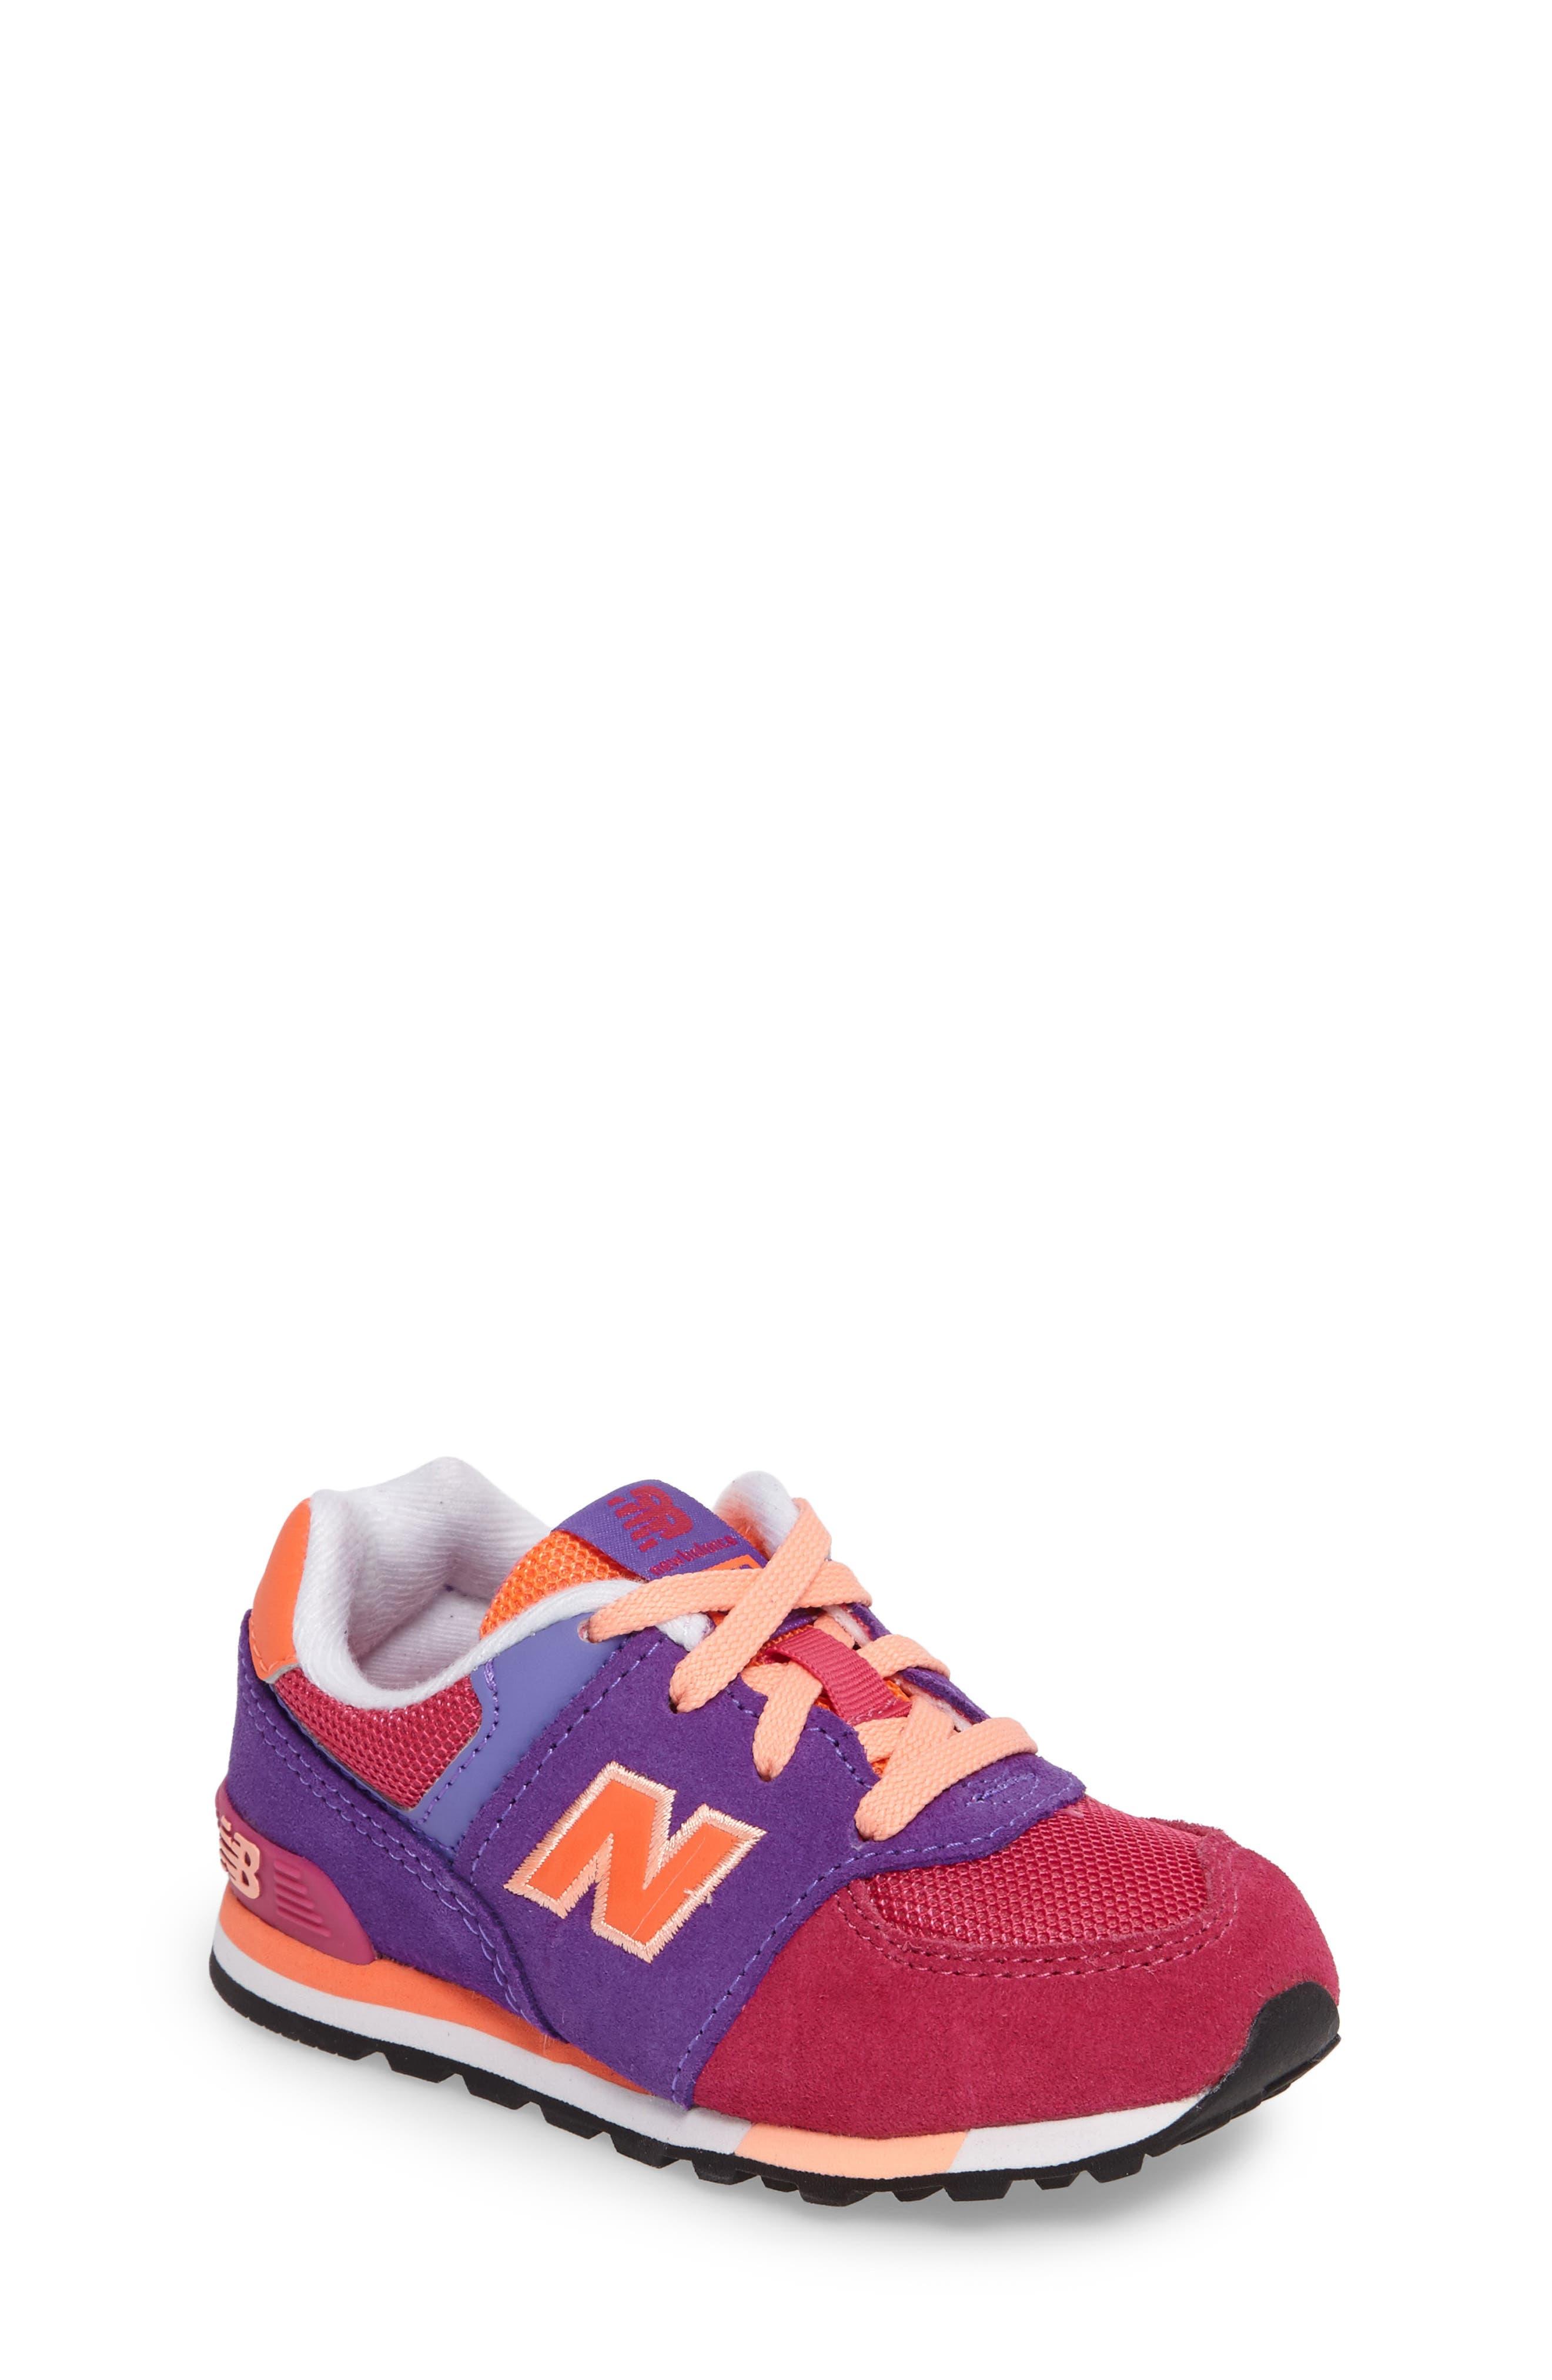 New Balance 574 Cut & Paste Sneaker (Baby, Walker & Toddler)